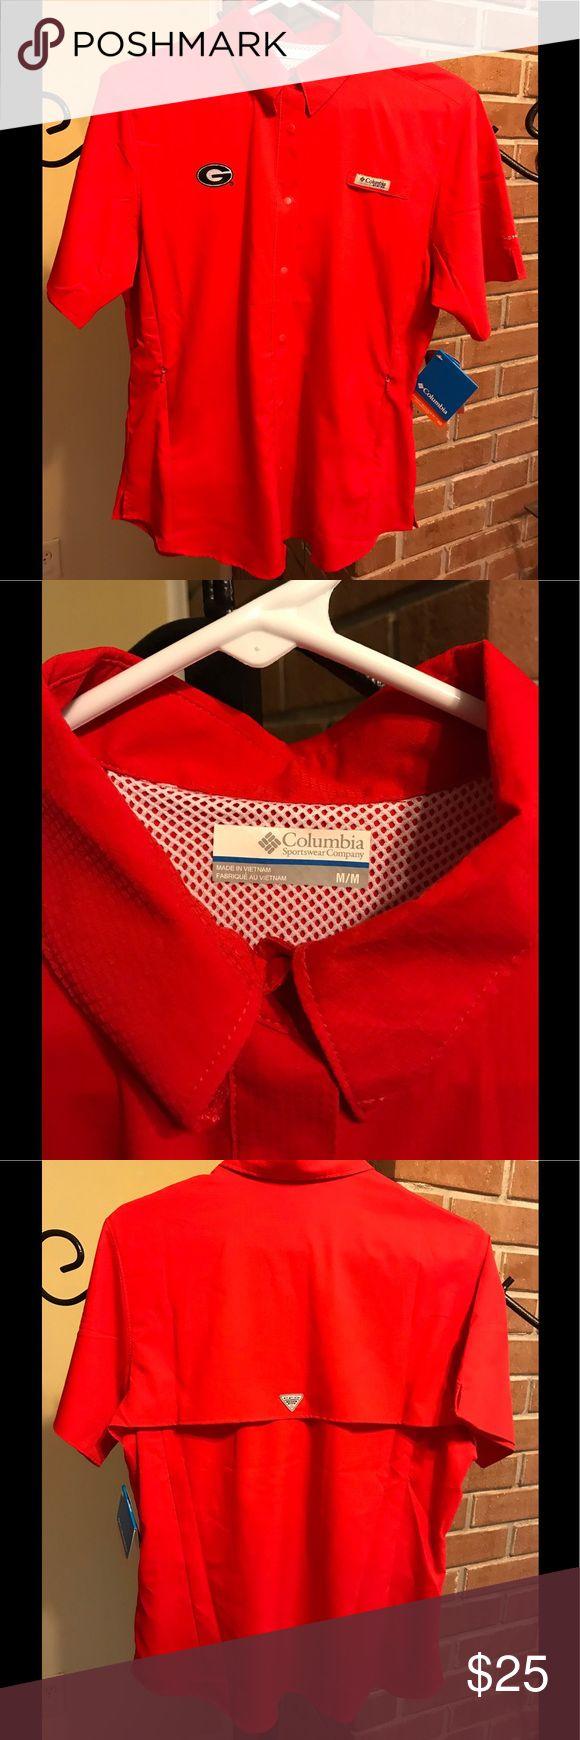 Brand new Georgia Bulldog Columbia PFG shirt Brand new Columbia Tops Button Down Shirts